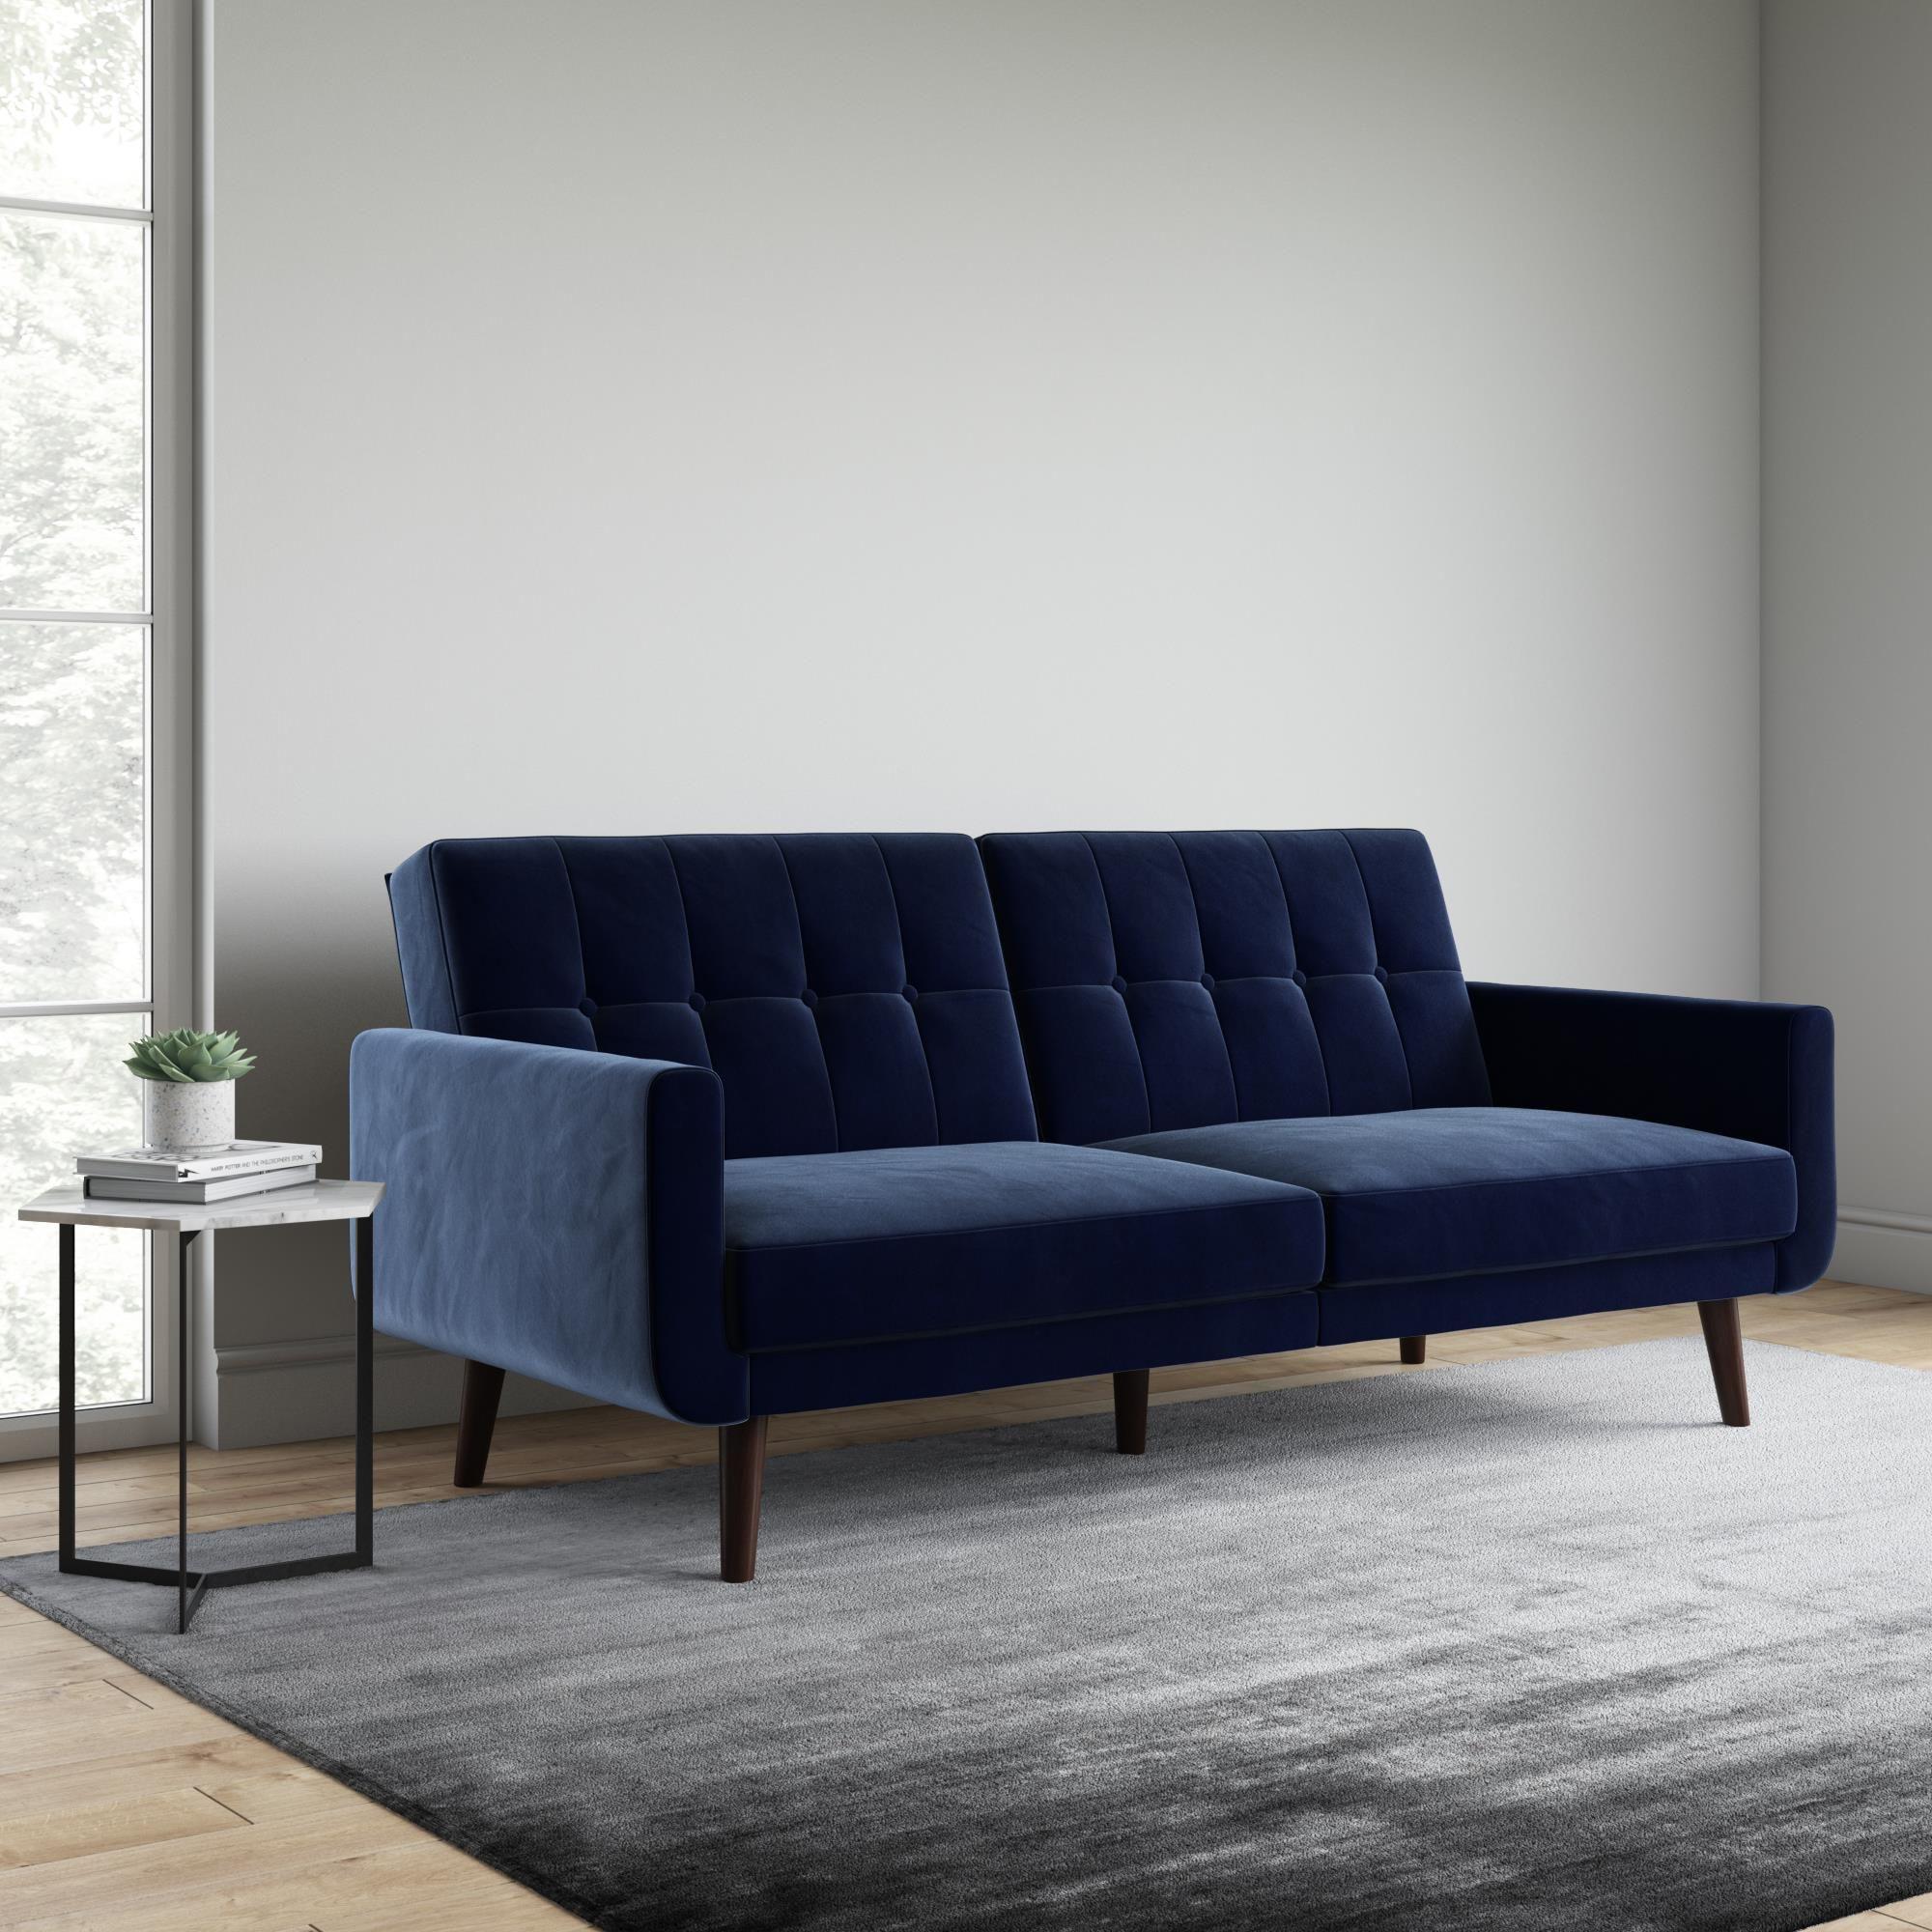 Better Homes And Gardens Nola Modern Futon Blue Velvet Walmart Com Modern Sofa Bed Modern Futon Comfortable Futon